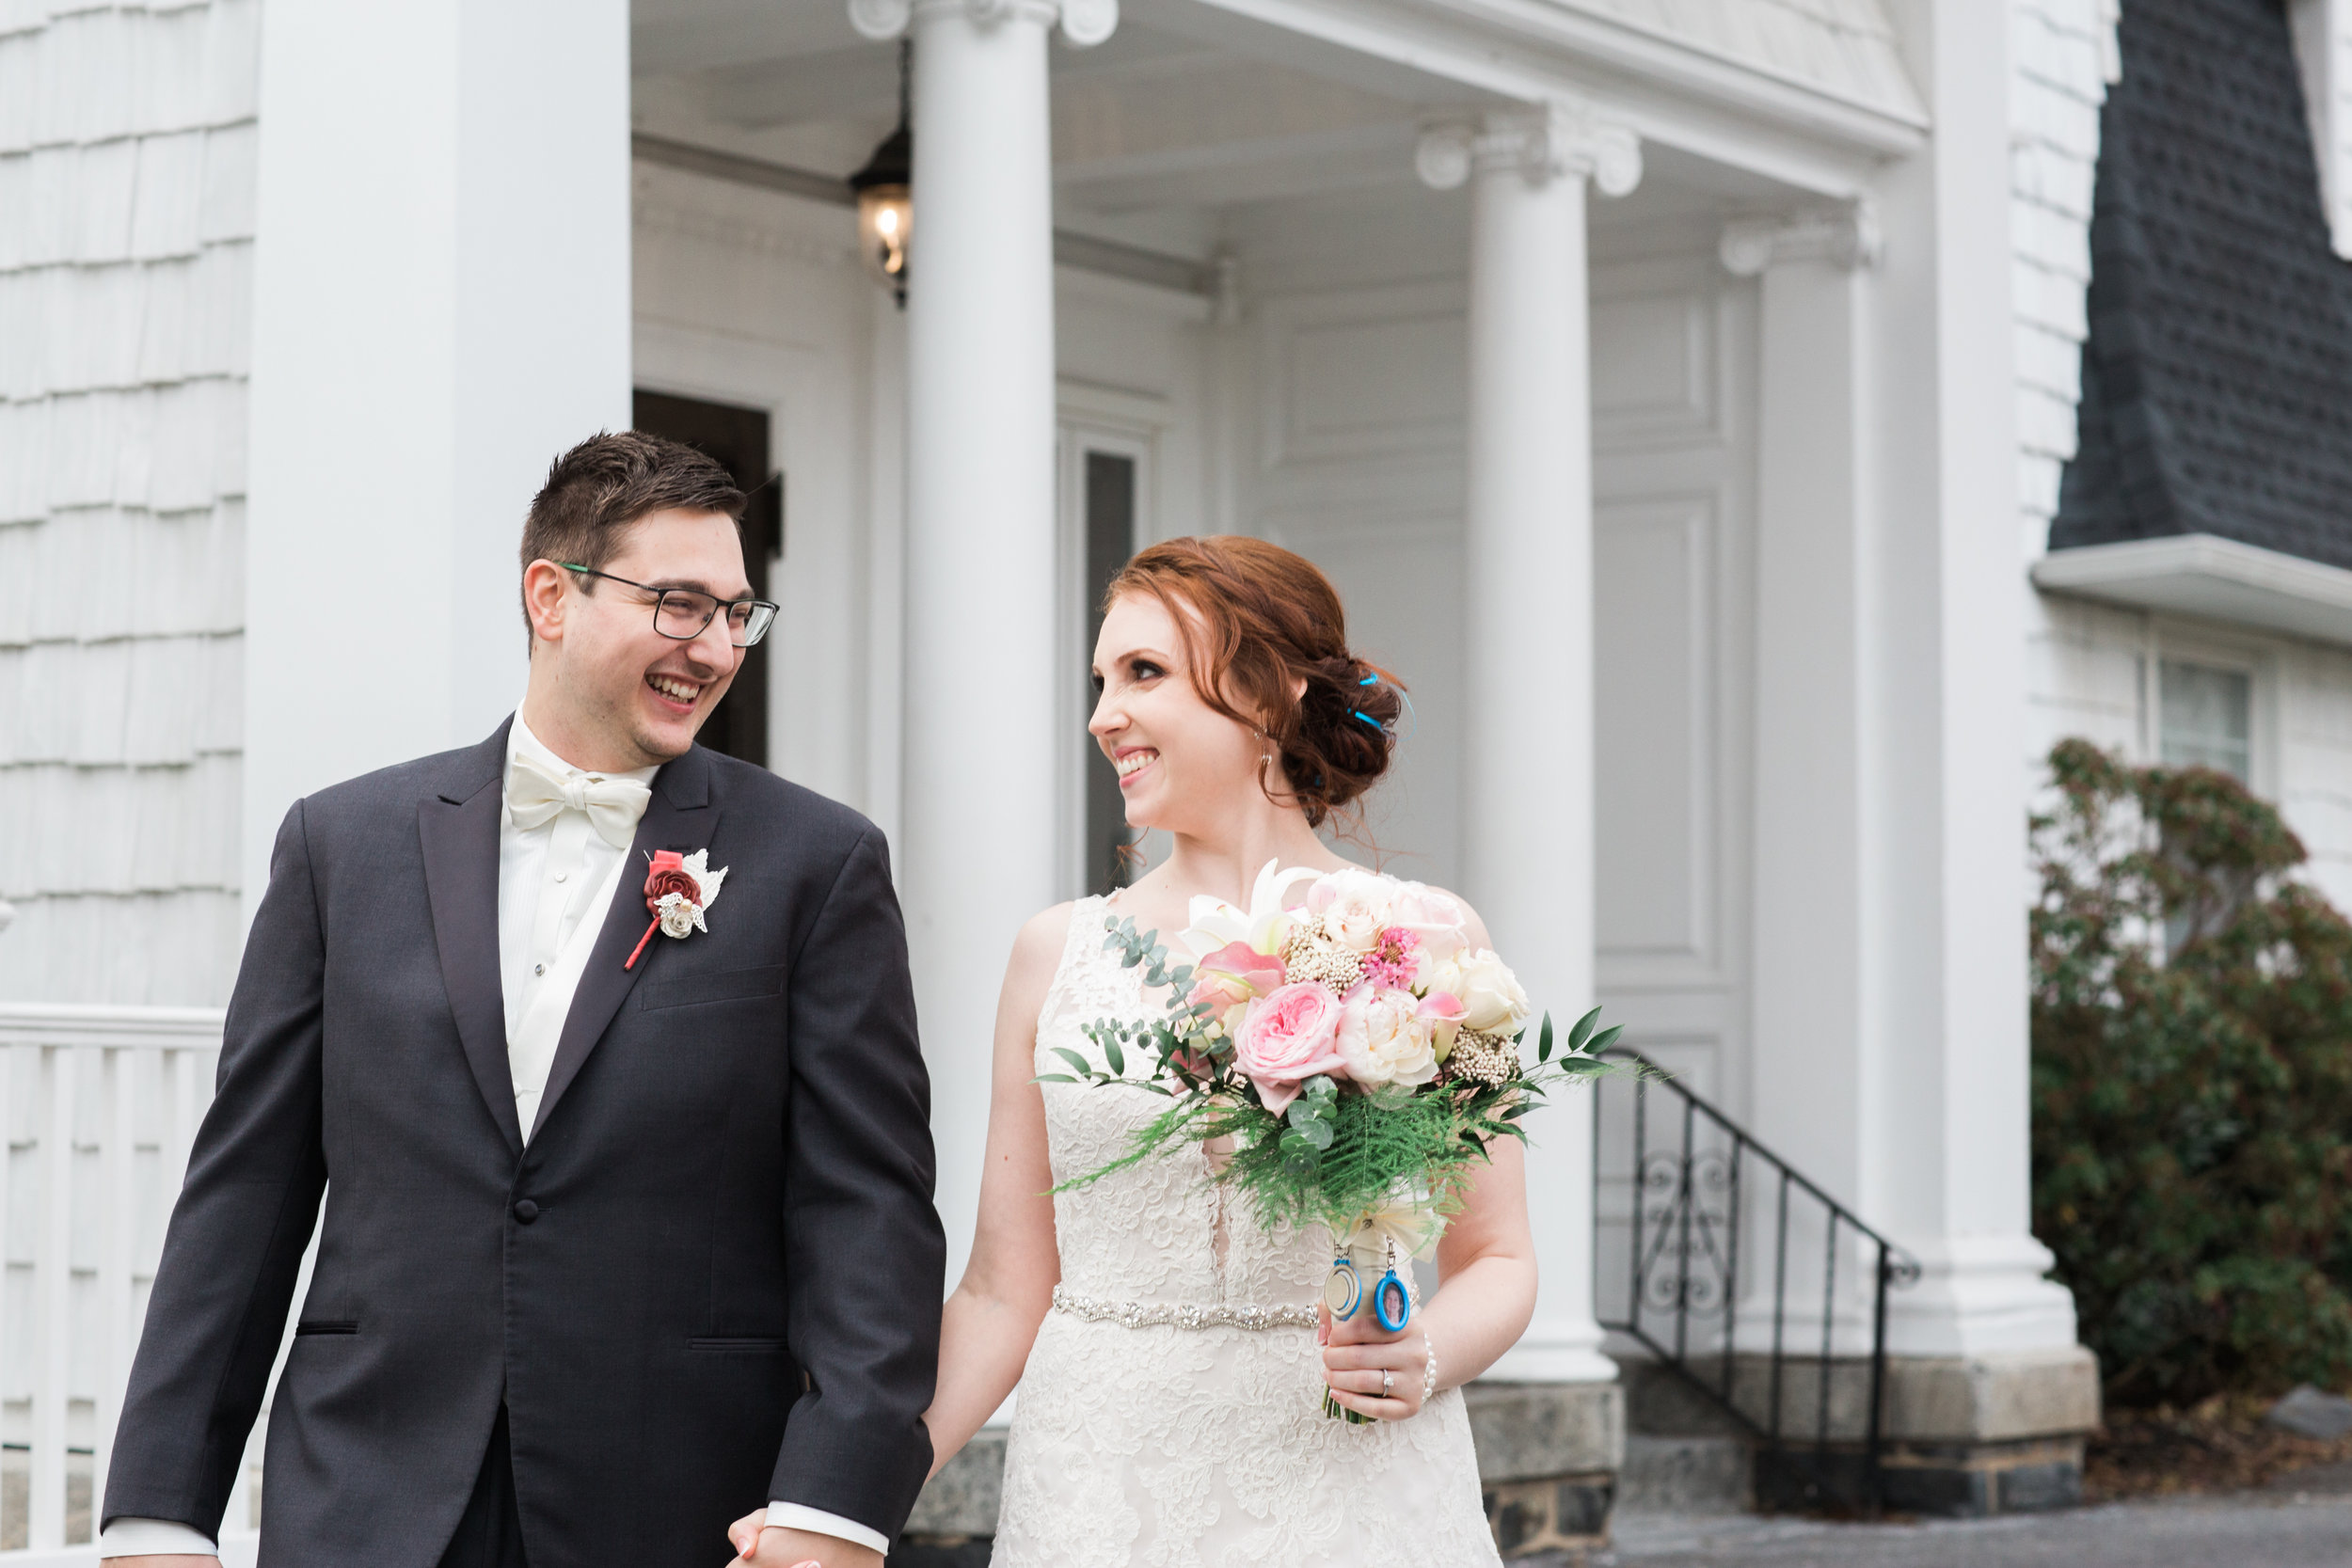 Harry Potter Wedding at Overhills Mansion Catonville Maryland Wedding Photographers Megapixels Media (38 of 134).jpg